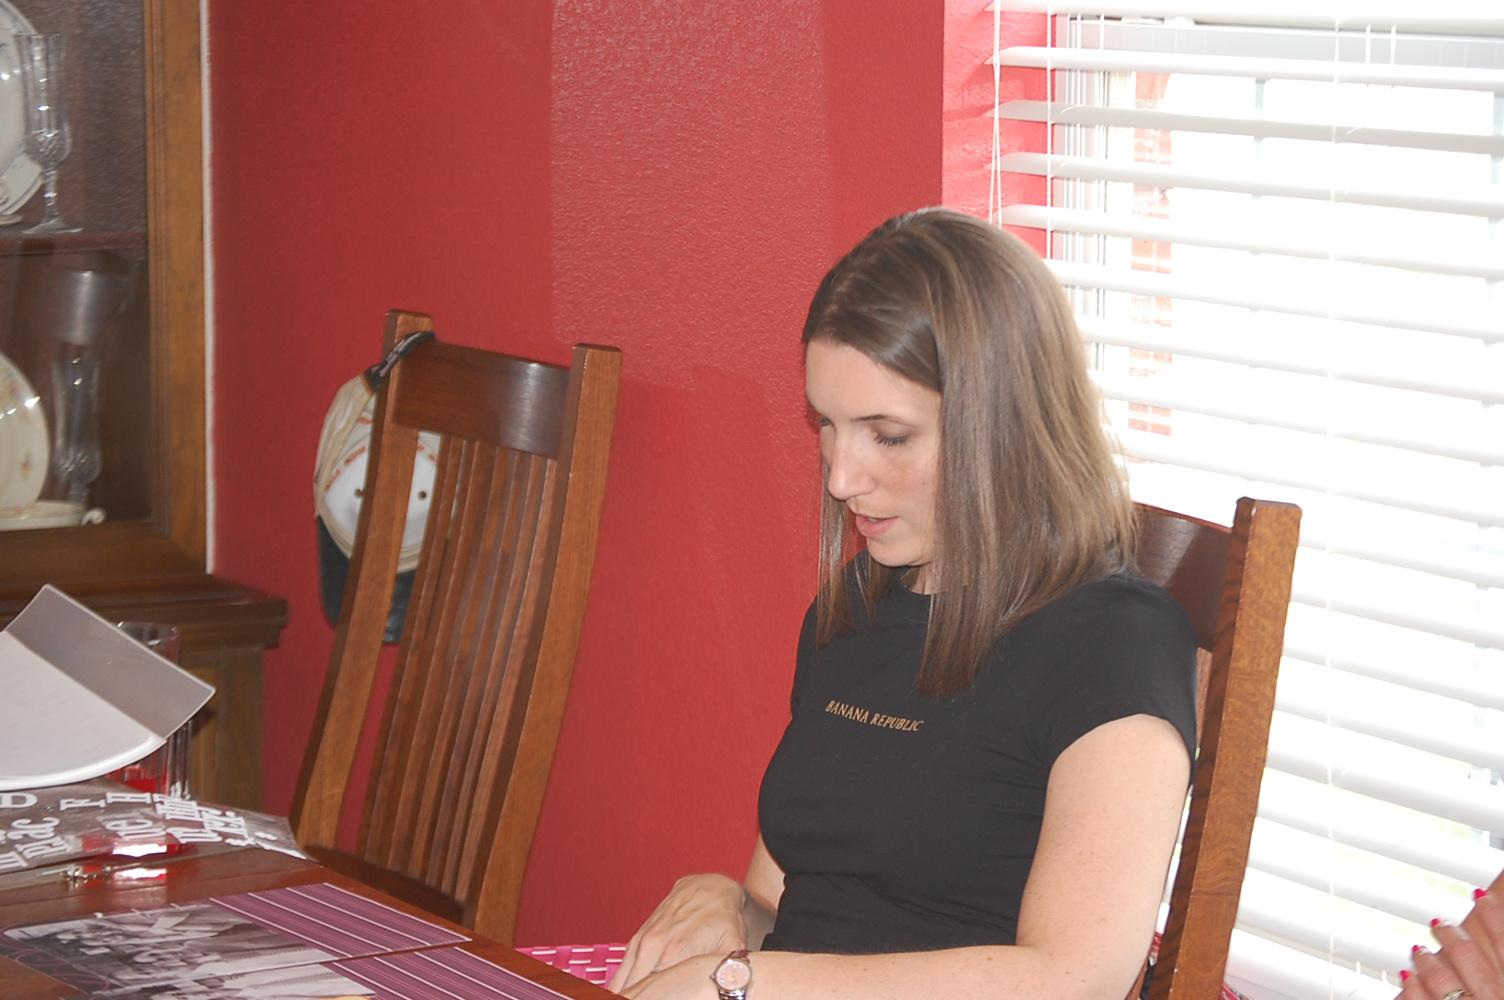 Kelley at Work